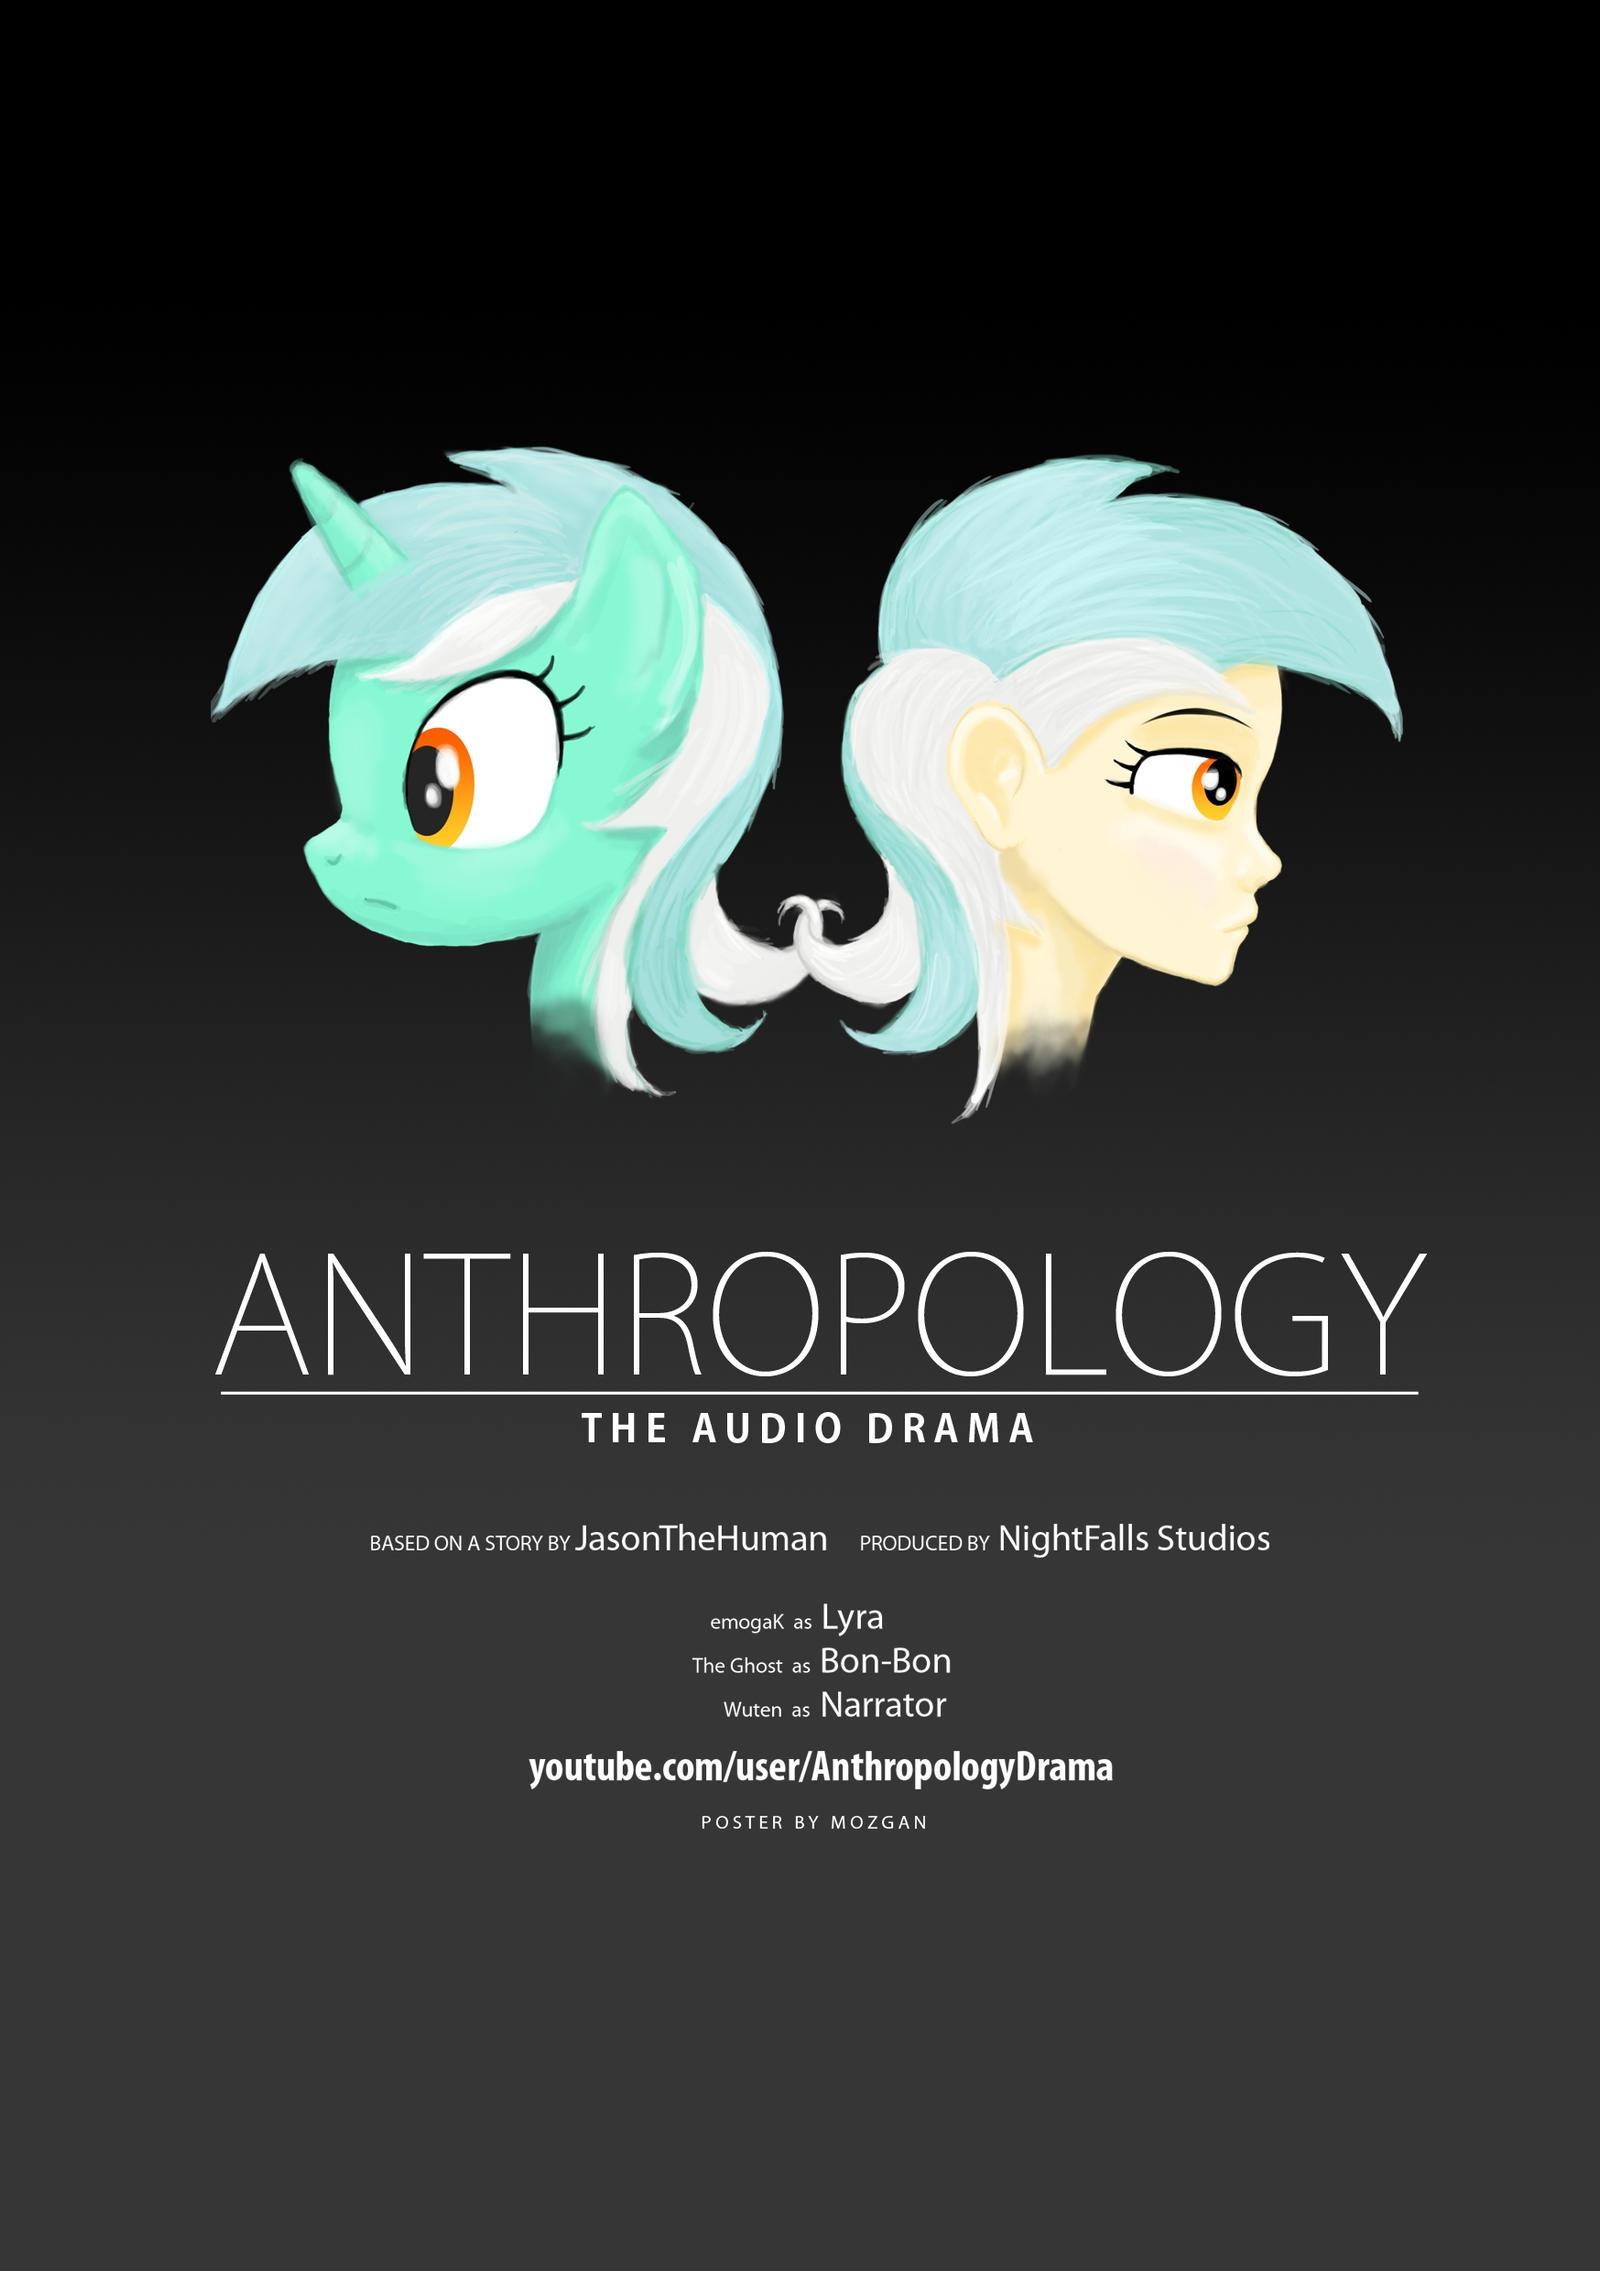 Anthropology poster by Mozgan on DeviantArt